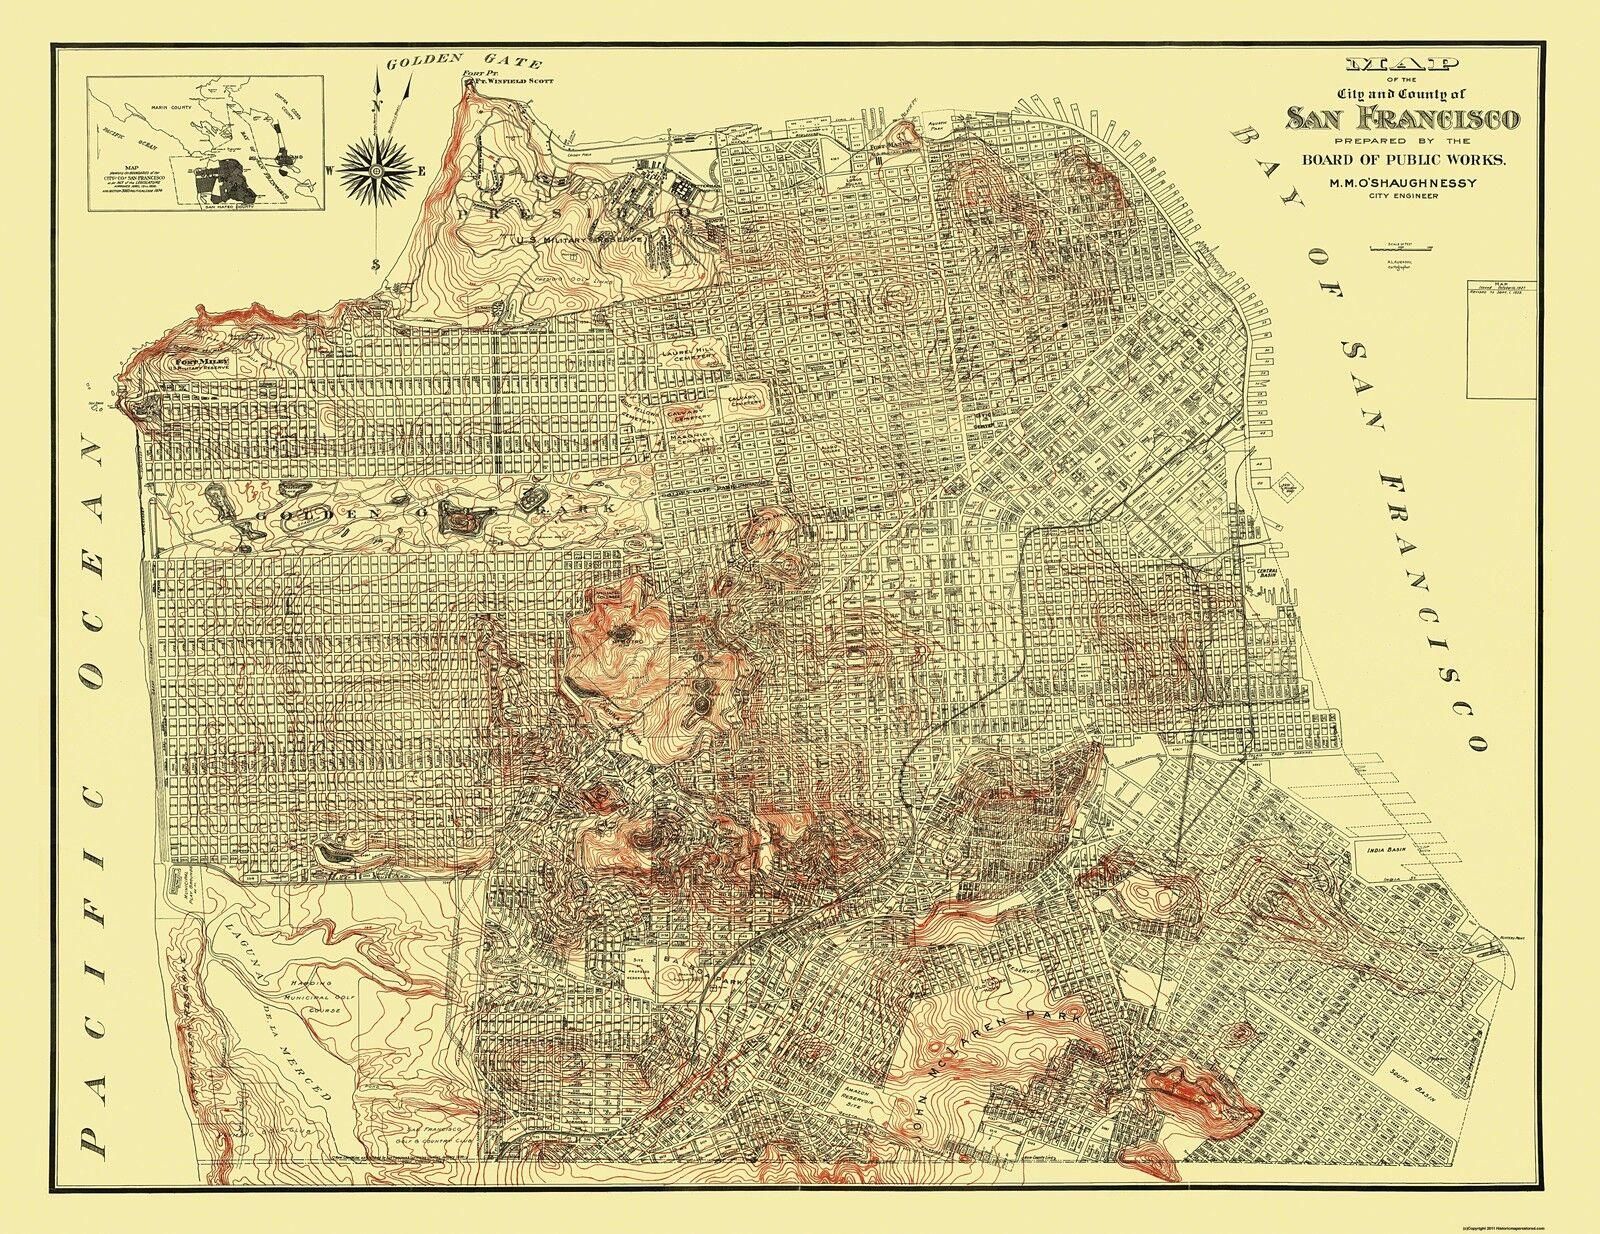 Topographic Maps - San Francisco California Map by The Board Pub ...